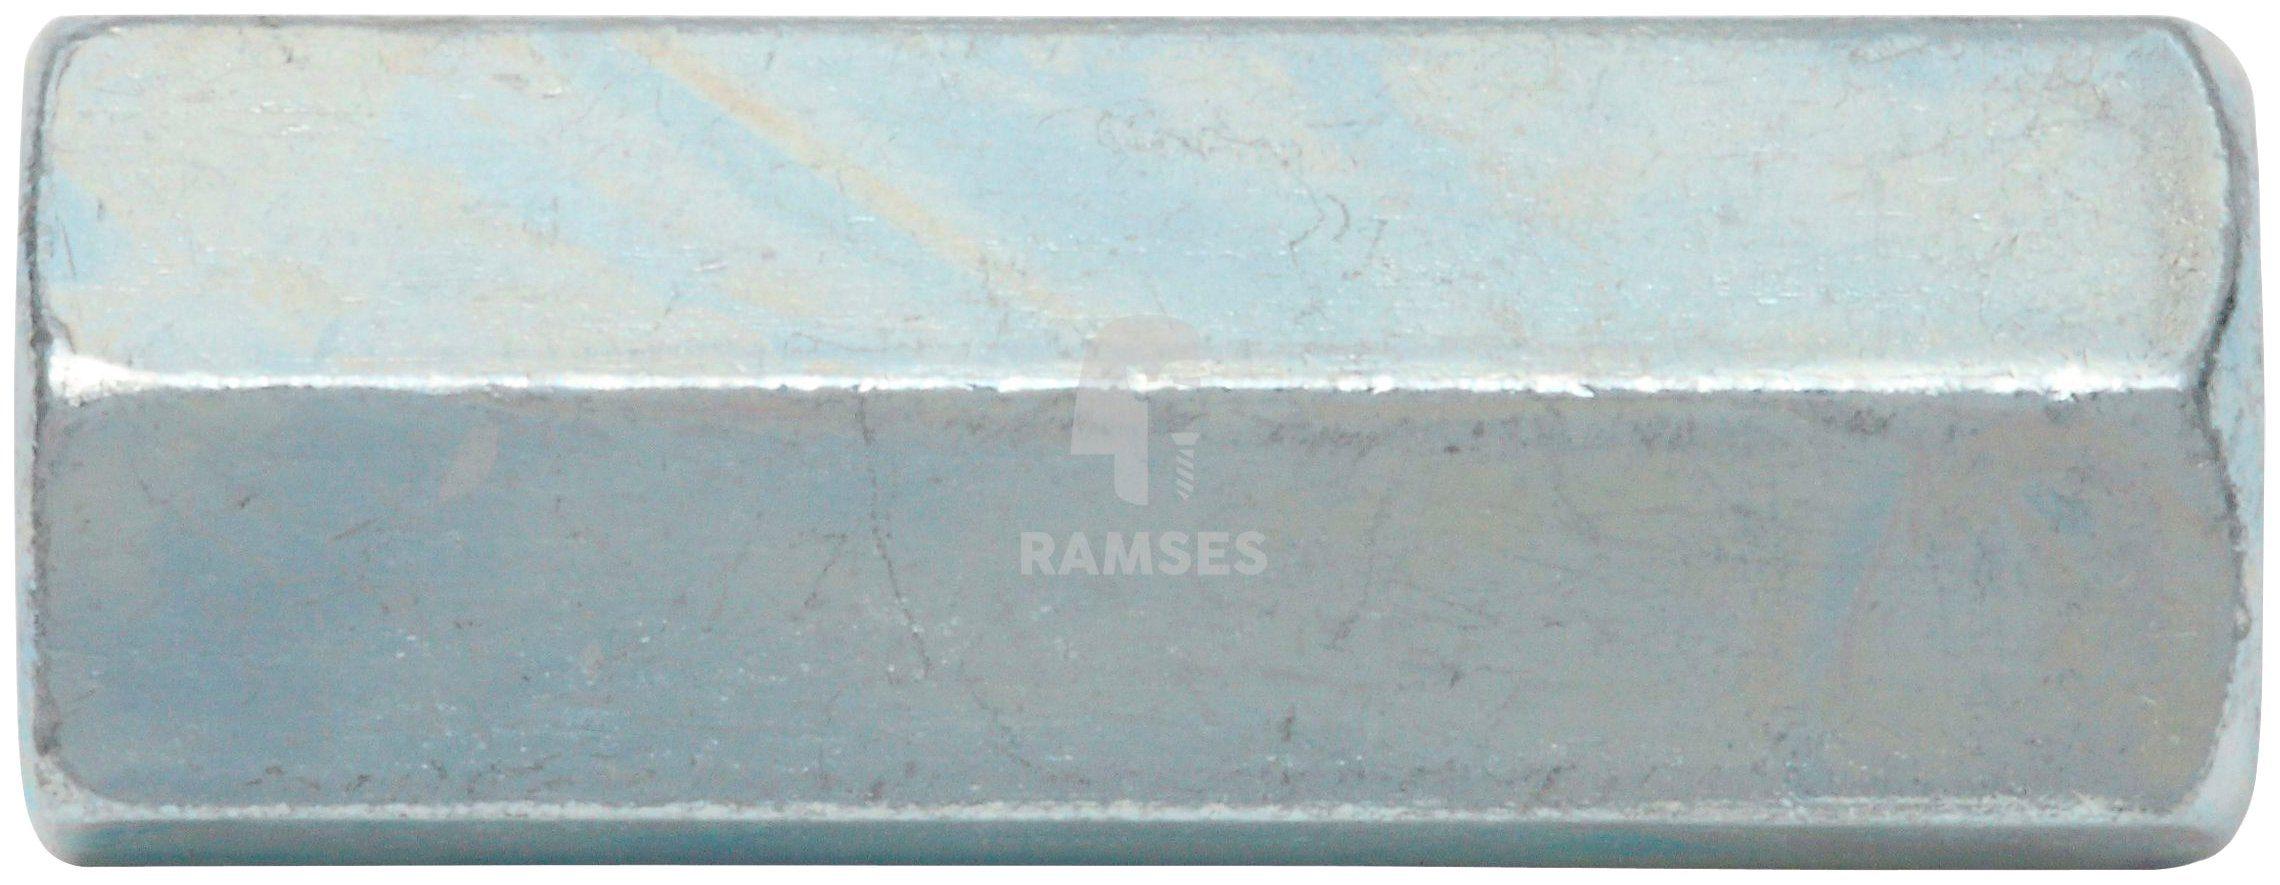 RAMSES Muffe , Sechskant Gewindemuffe M14 X 40